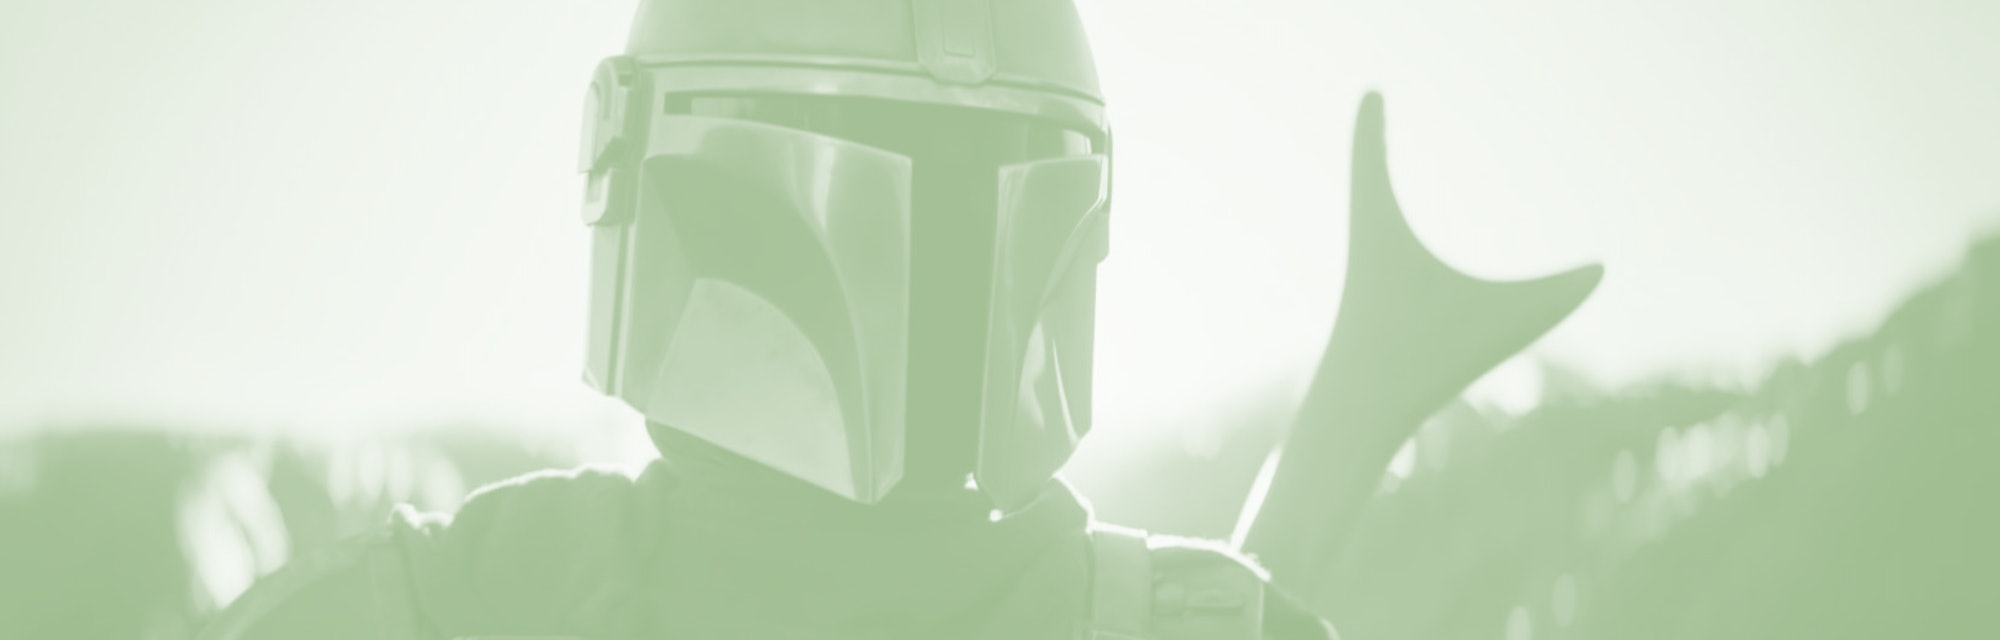 Mandalorian Season 2 Theory Solves Rise Of Skywalker S Biggest Mystery